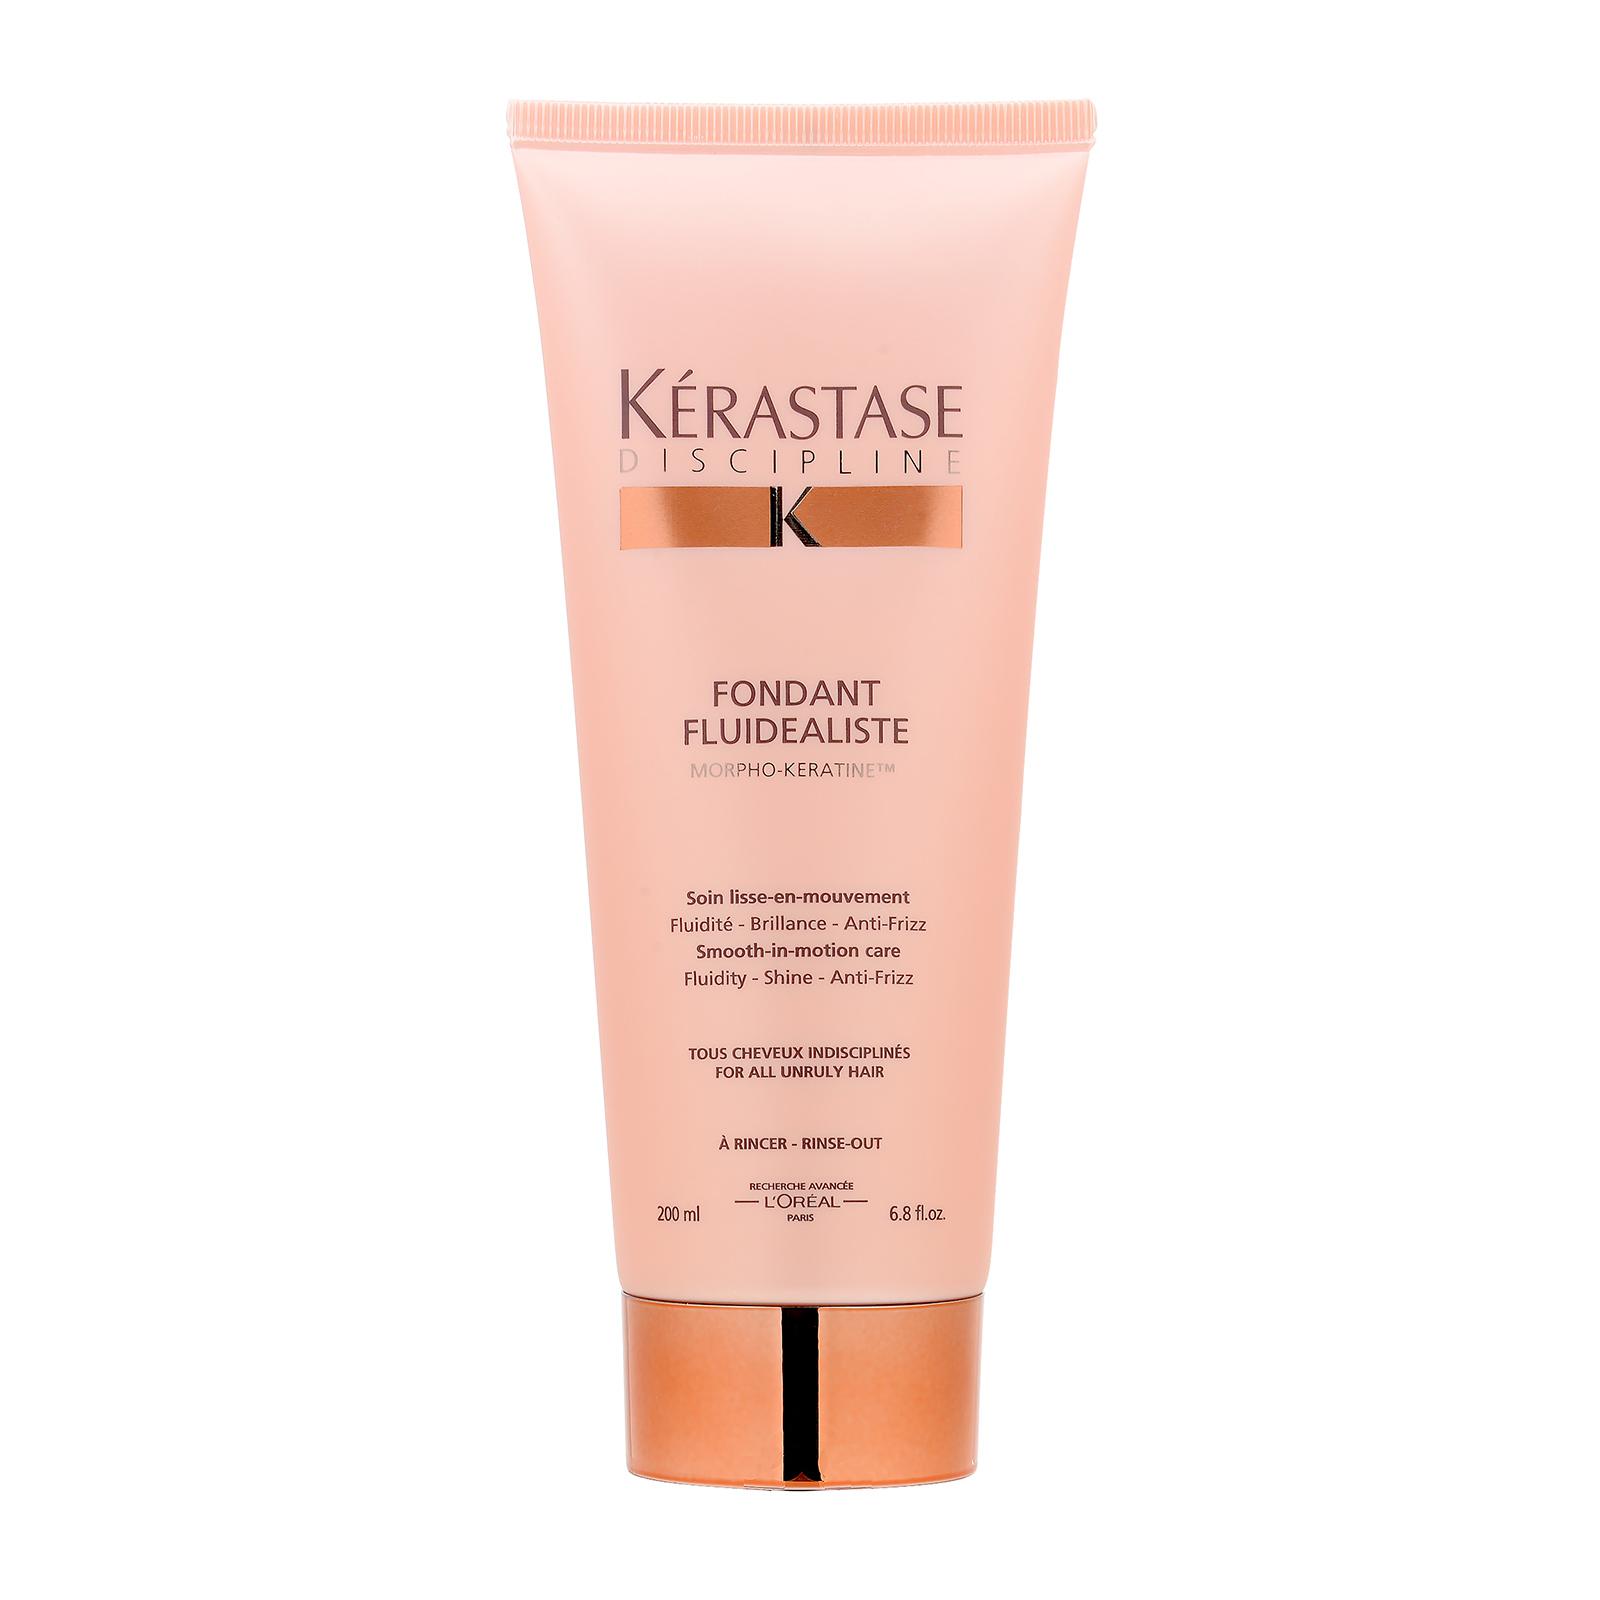 Kérastase Paris Discipline Fondant Fluidealiste Smooth-in-Motion Care (For All Unruly Hair) 6.8oz, 200ml